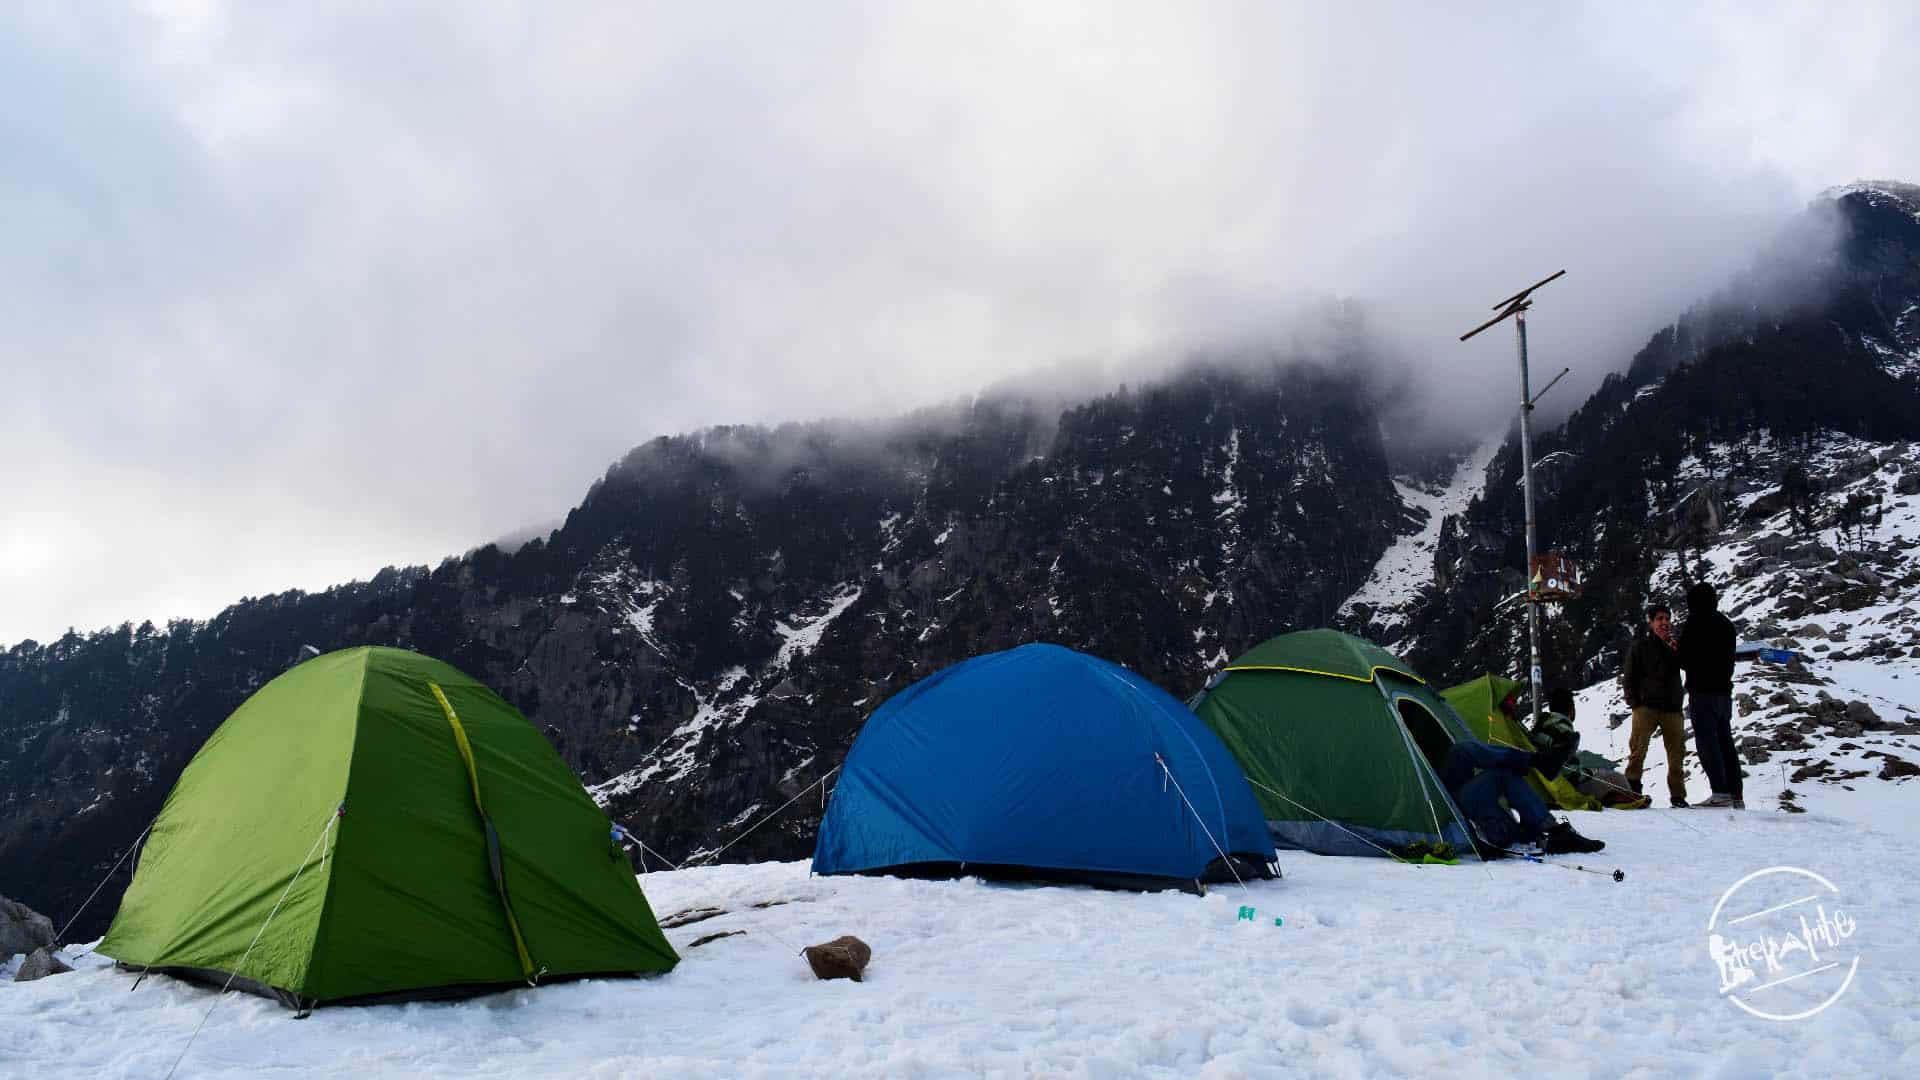 Trekatribe camping - Triund Trek in Dharamshala